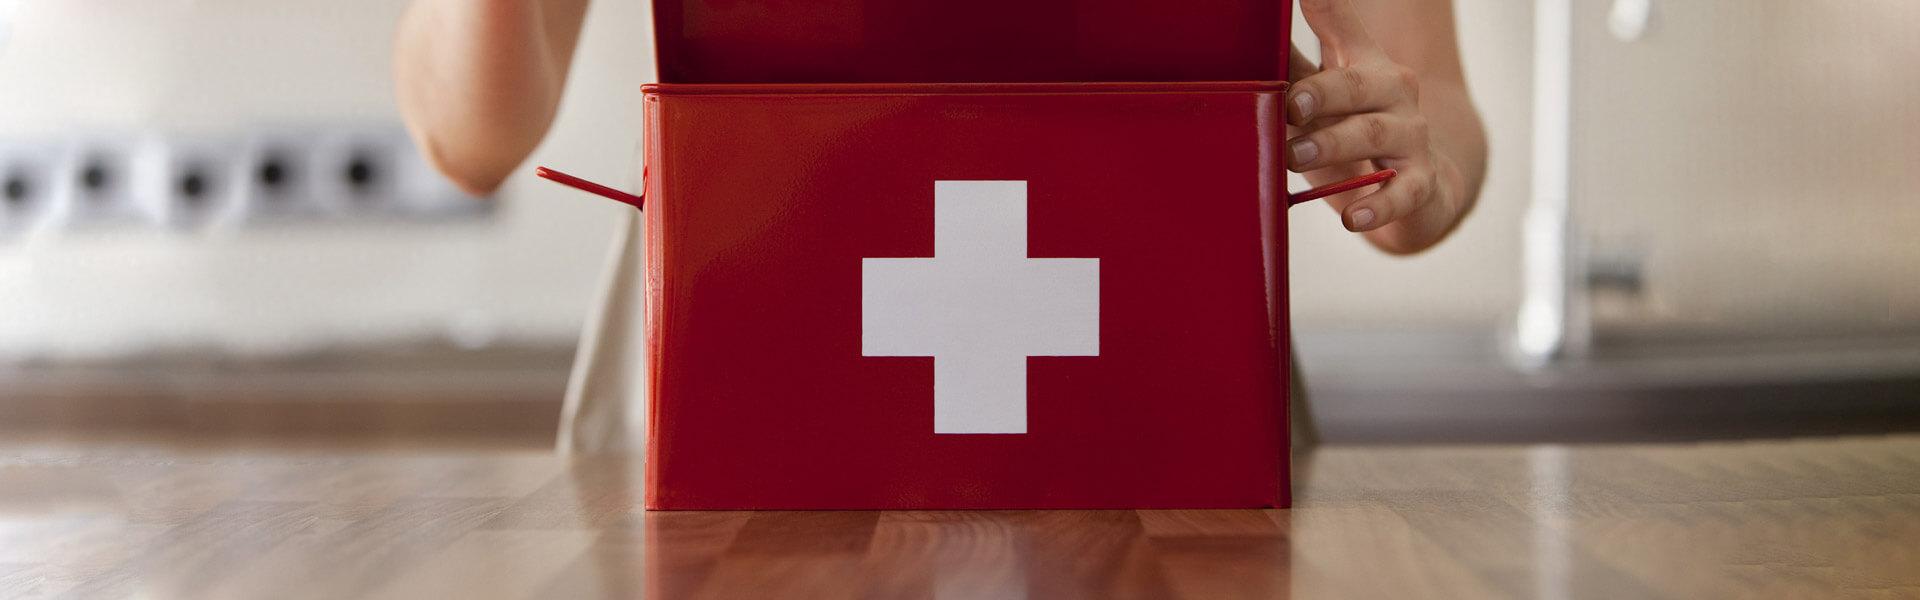 Emergency Kits and Disaster Preparedness for Households